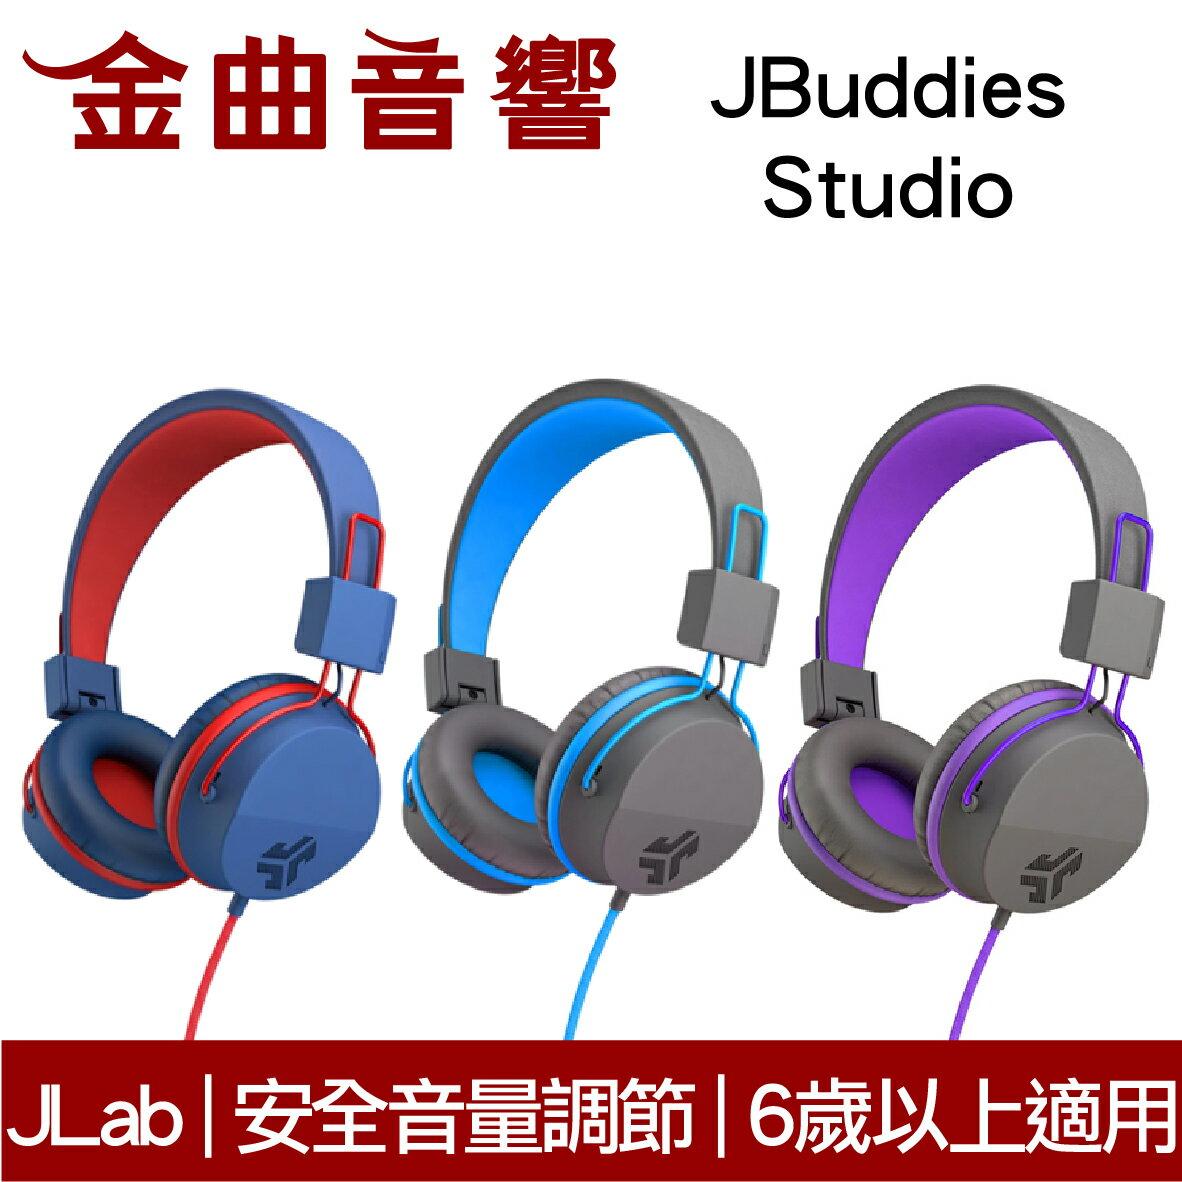 JLab JBuddies Studio 紫色 兒童 耳罩式耳機 | 金曲音響